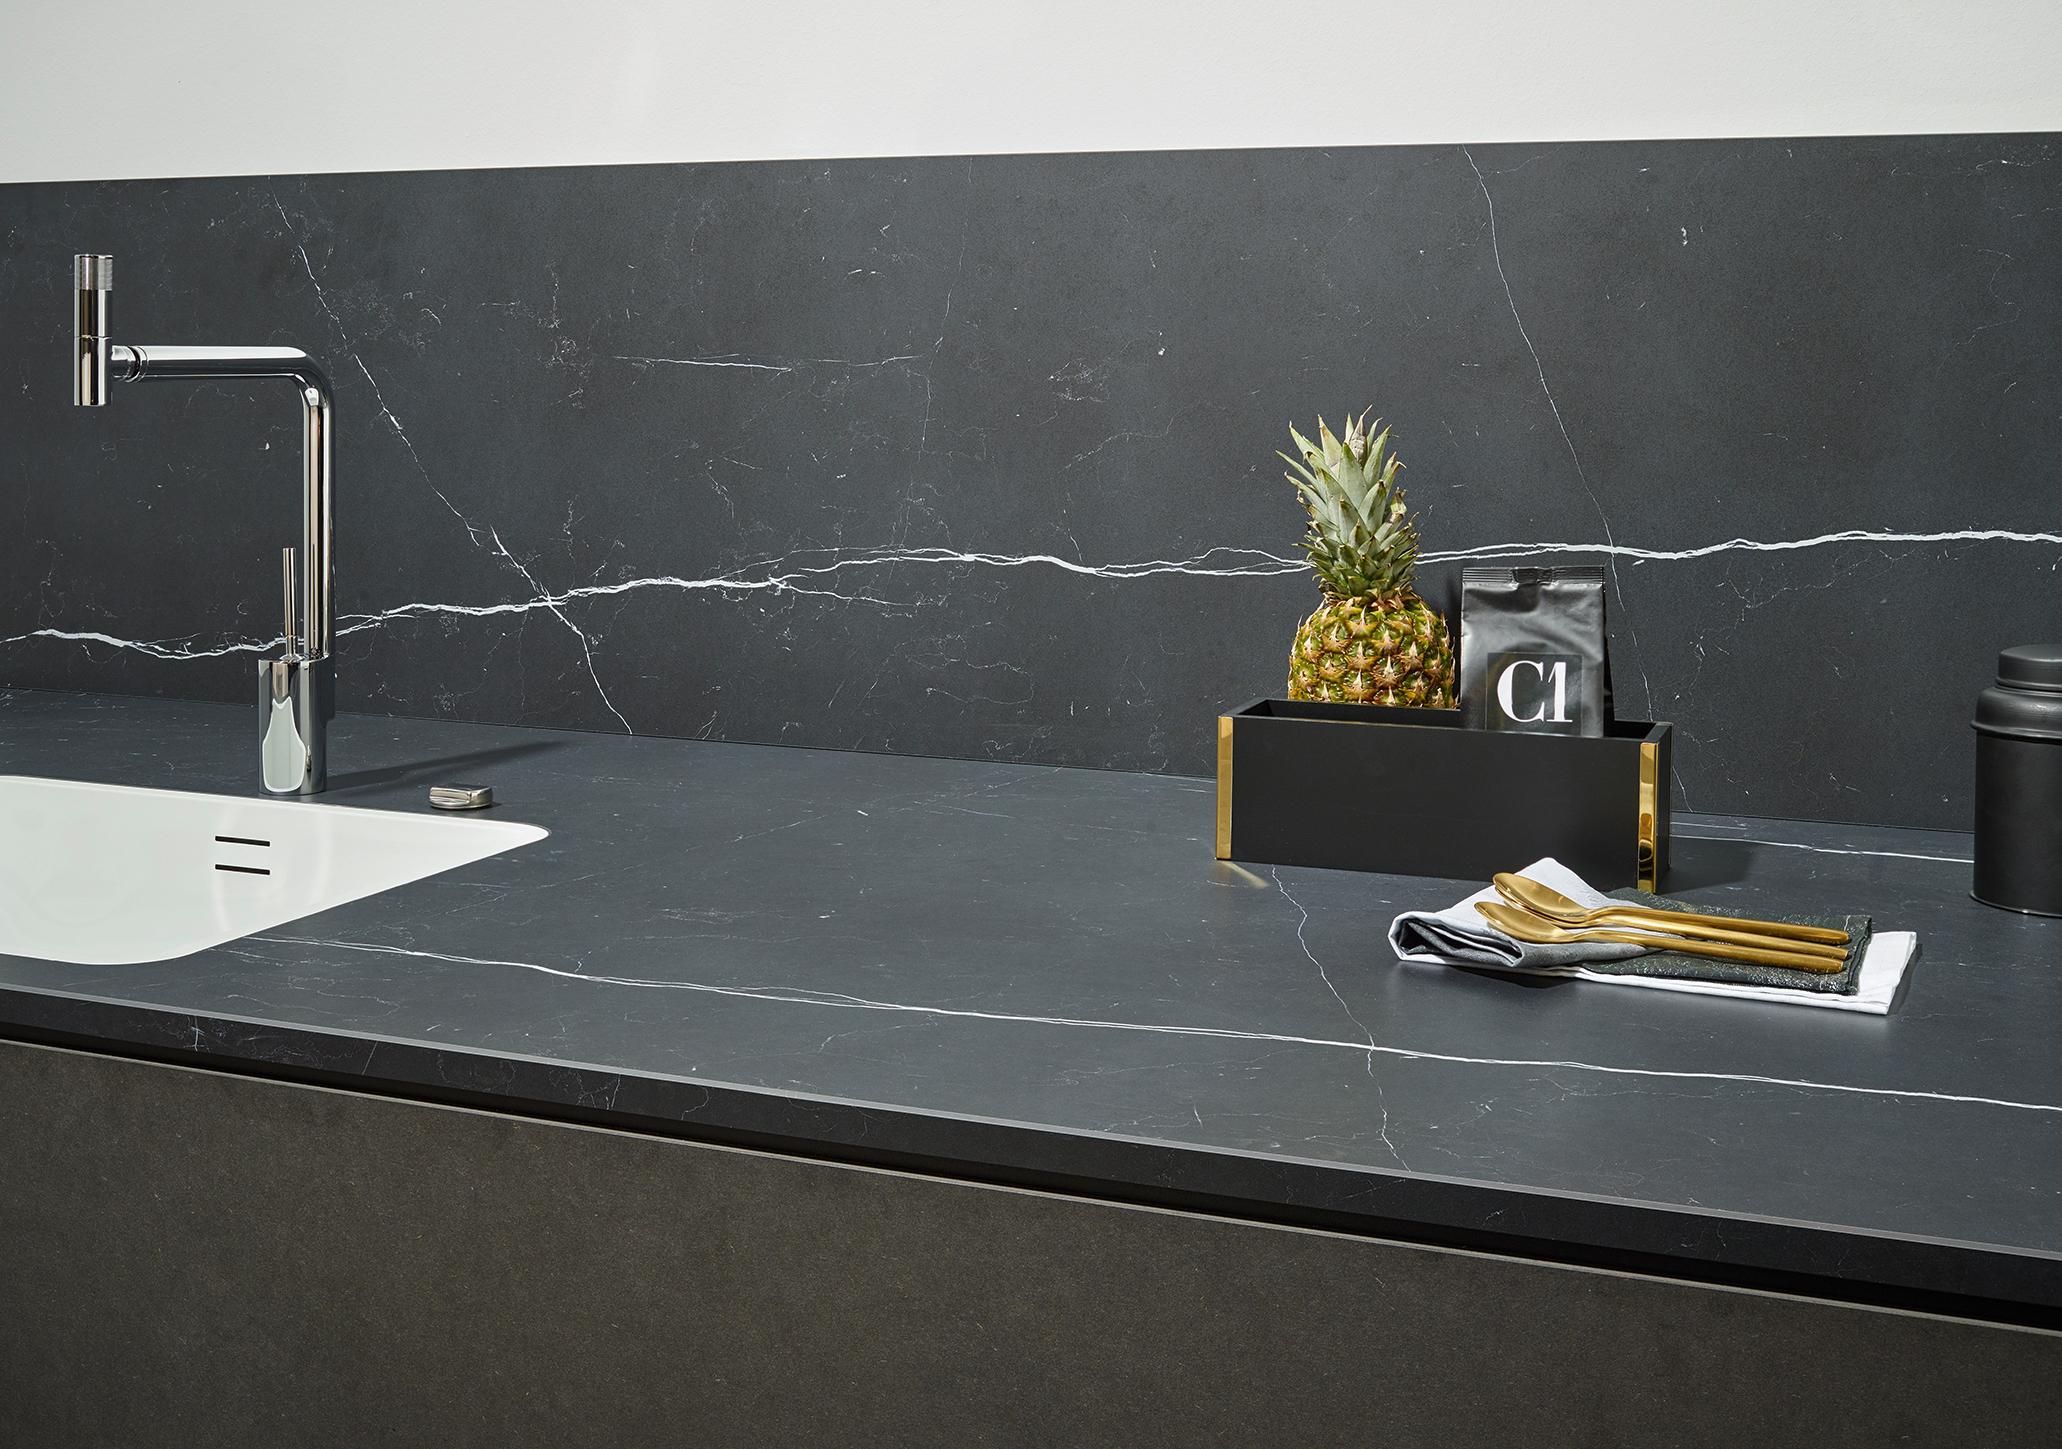 Relativ Küchenrückwand: Holz, Glas oder Metall? KW57